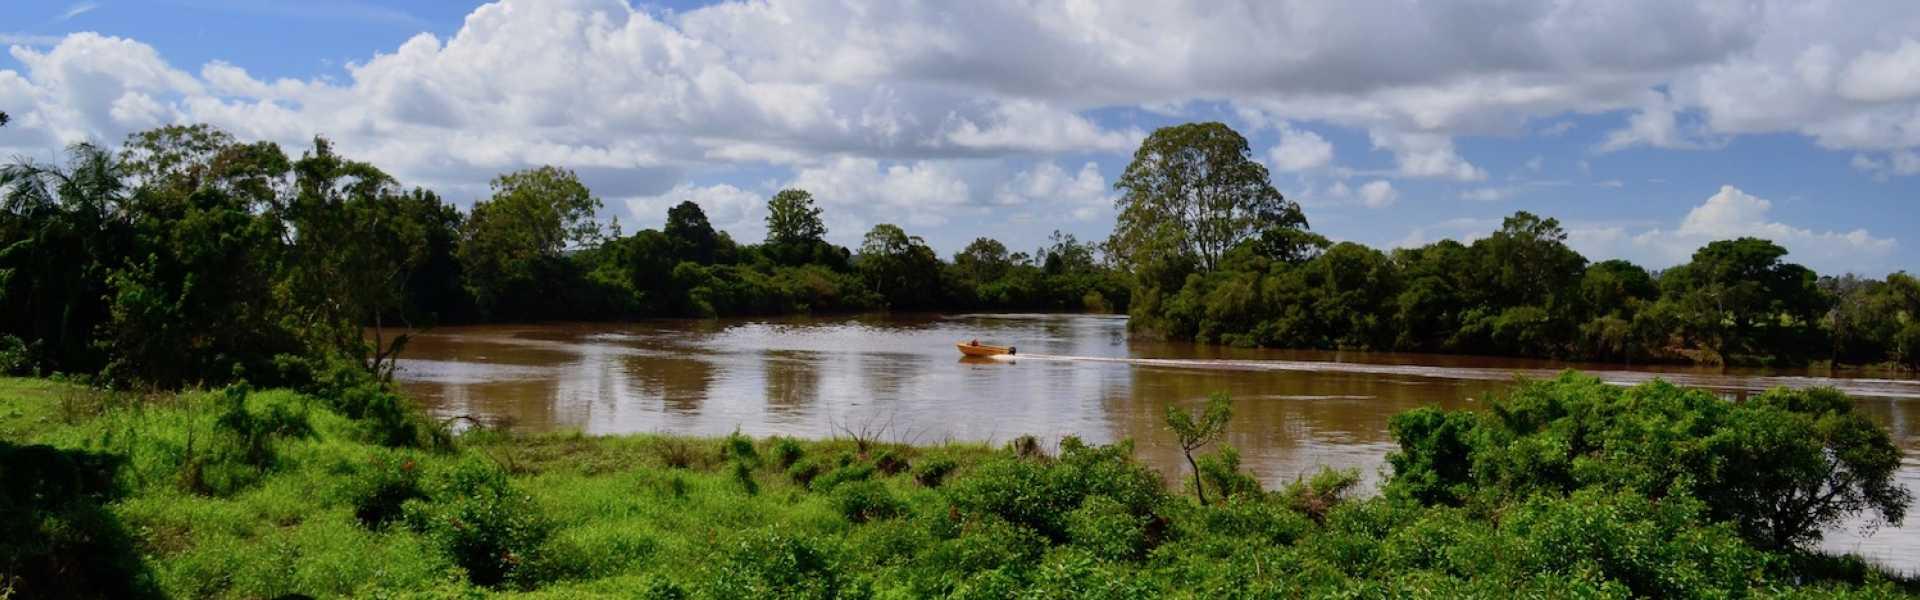 Kui Parks, Coraki Riverside Caravan Park, River